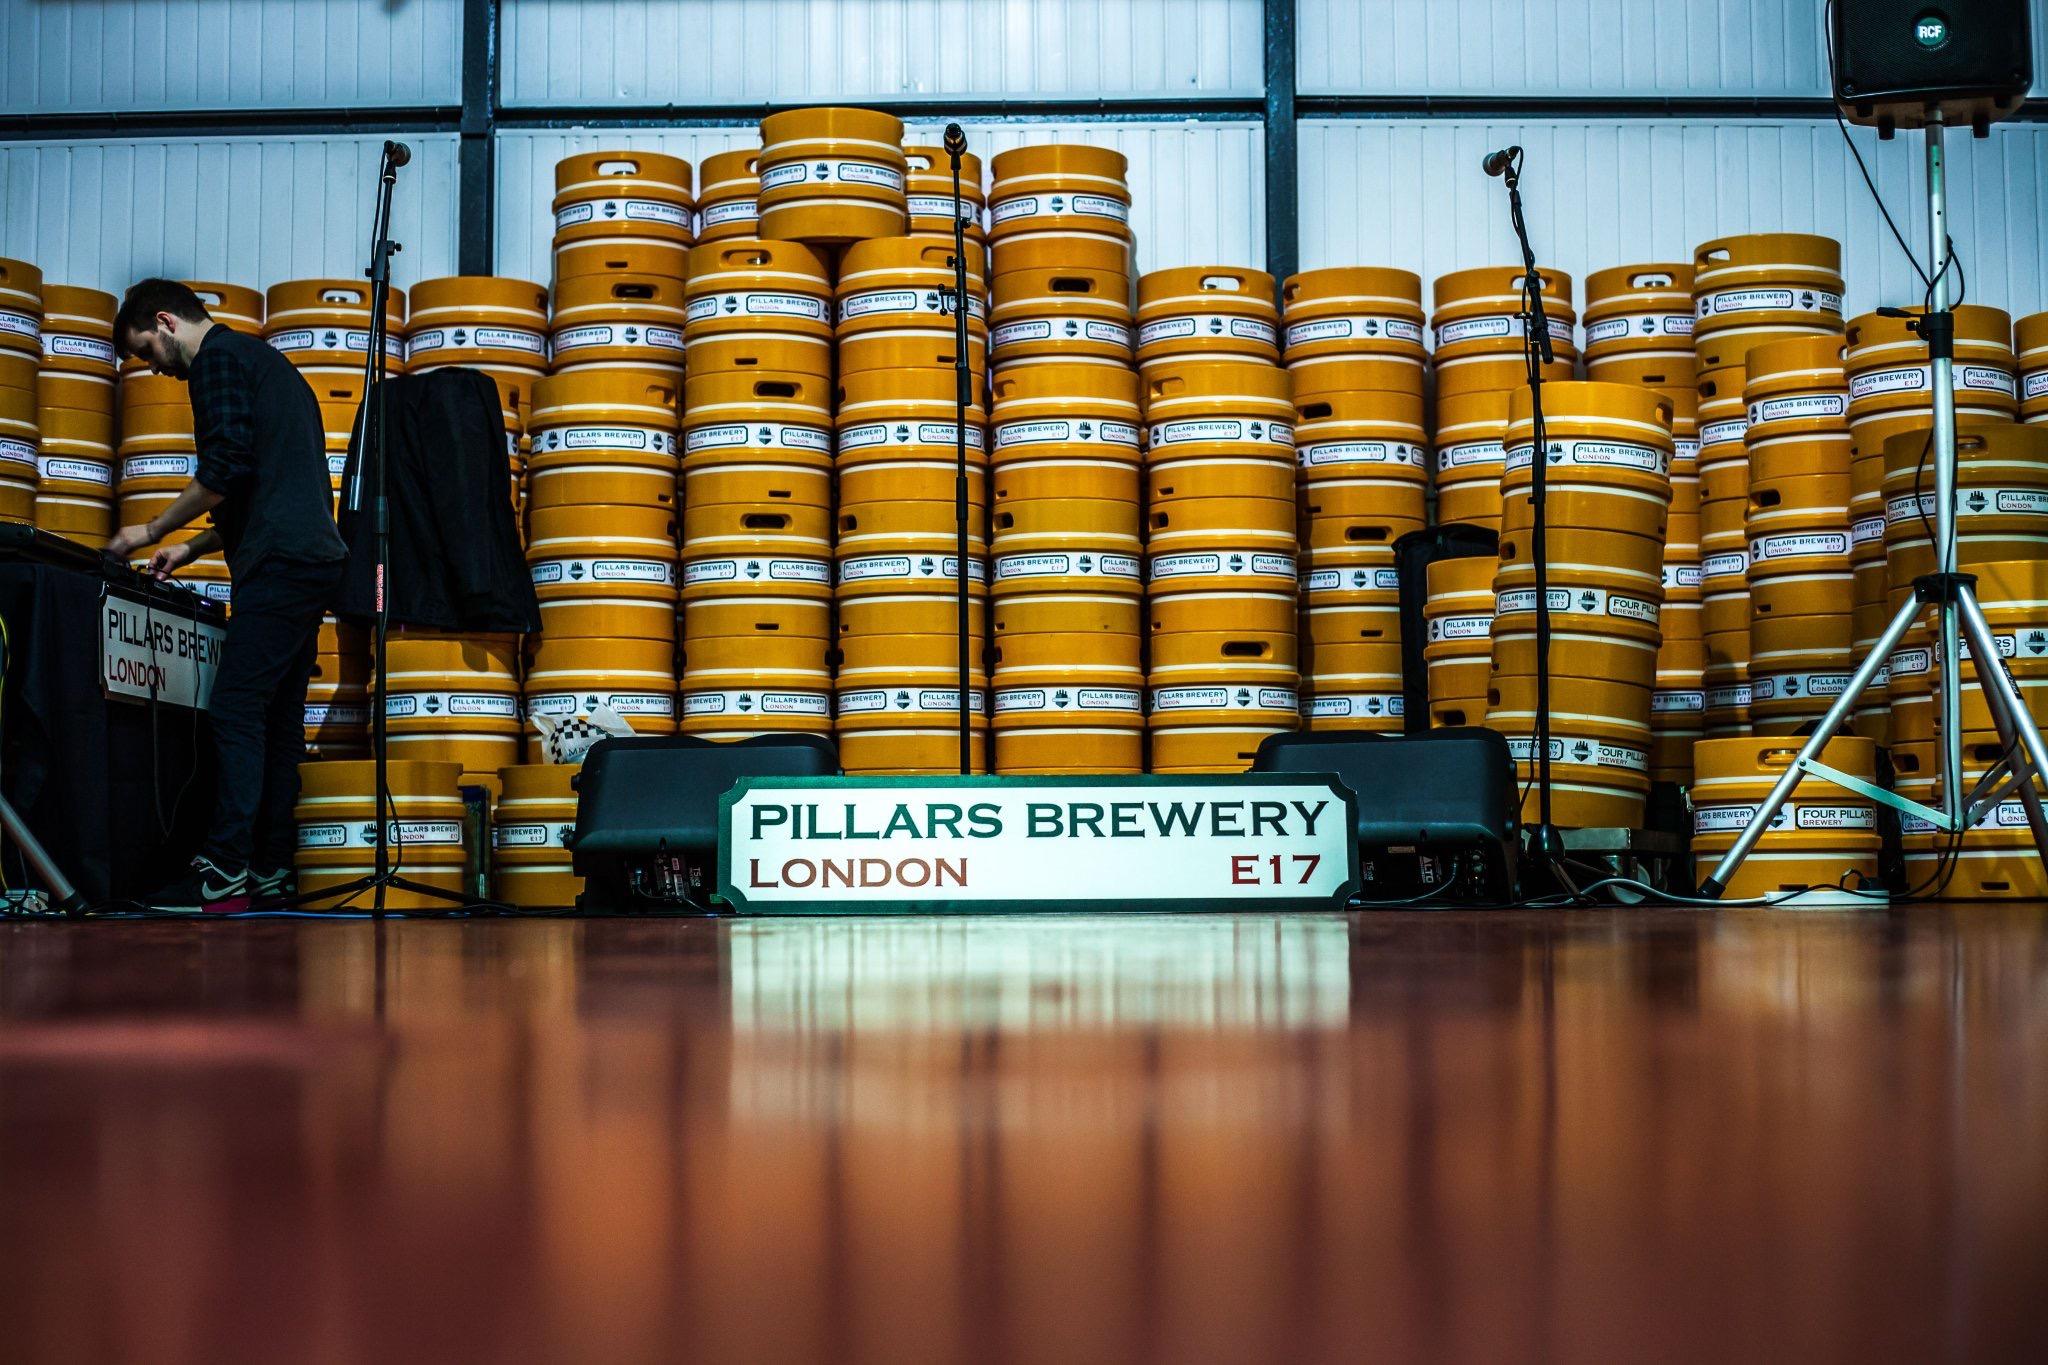 pillars brewery